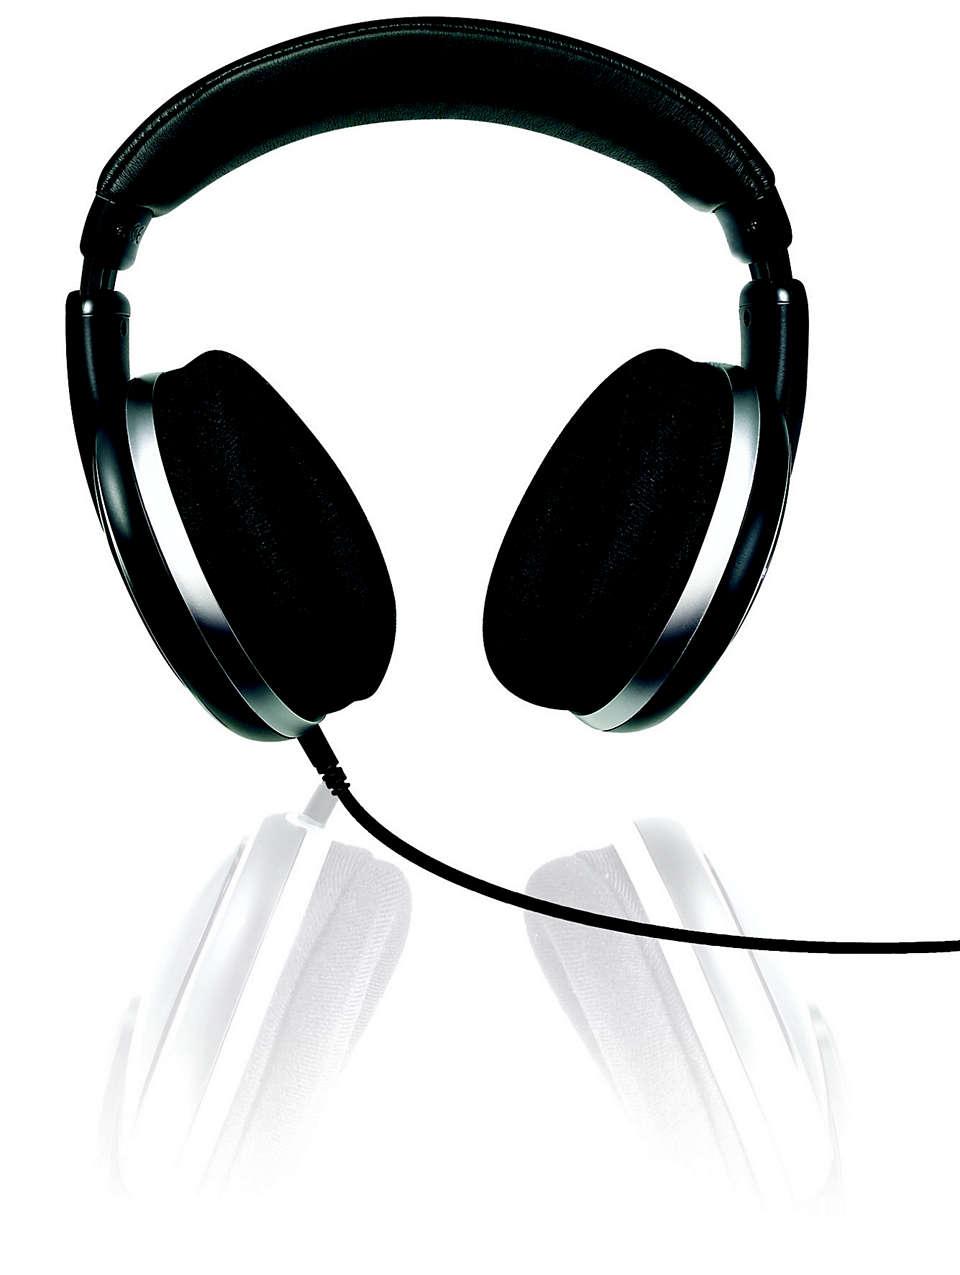 Dynamická reprodukce Hi-Fi zvuku